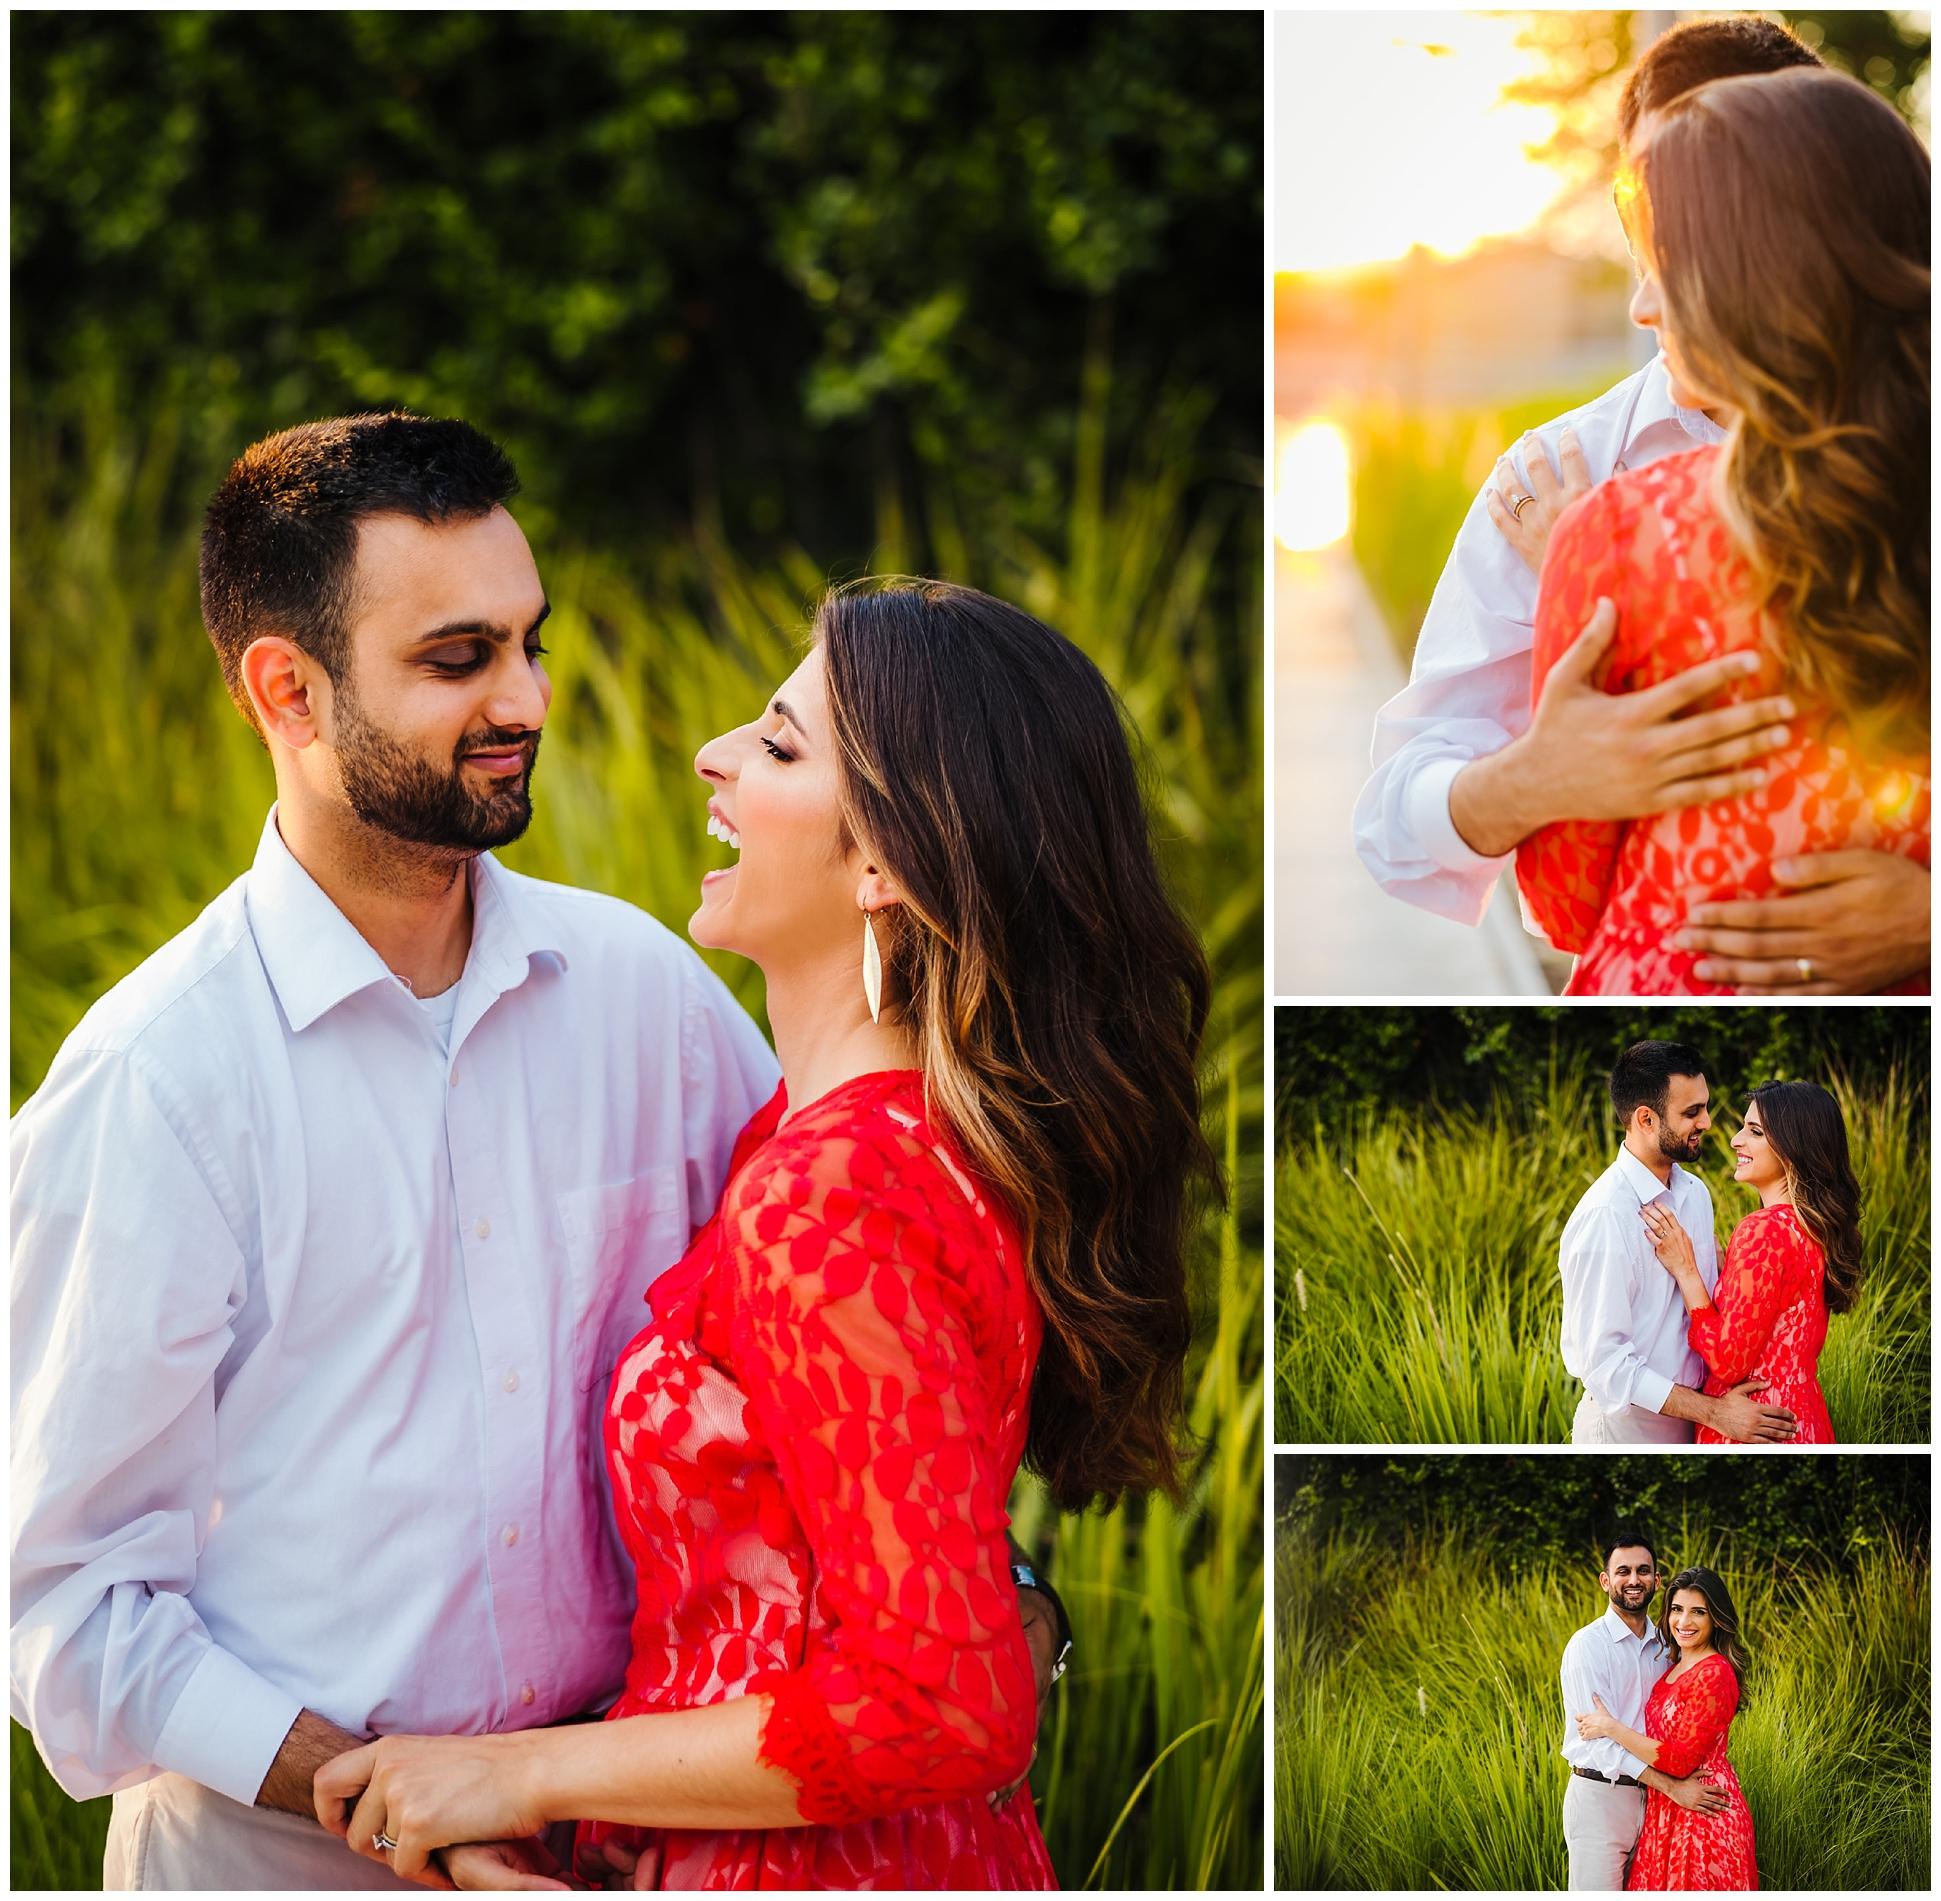 -tampa-st-pete-wedding-portrait-studio-photographer-colorful-vibrant-creative_0110.jpg